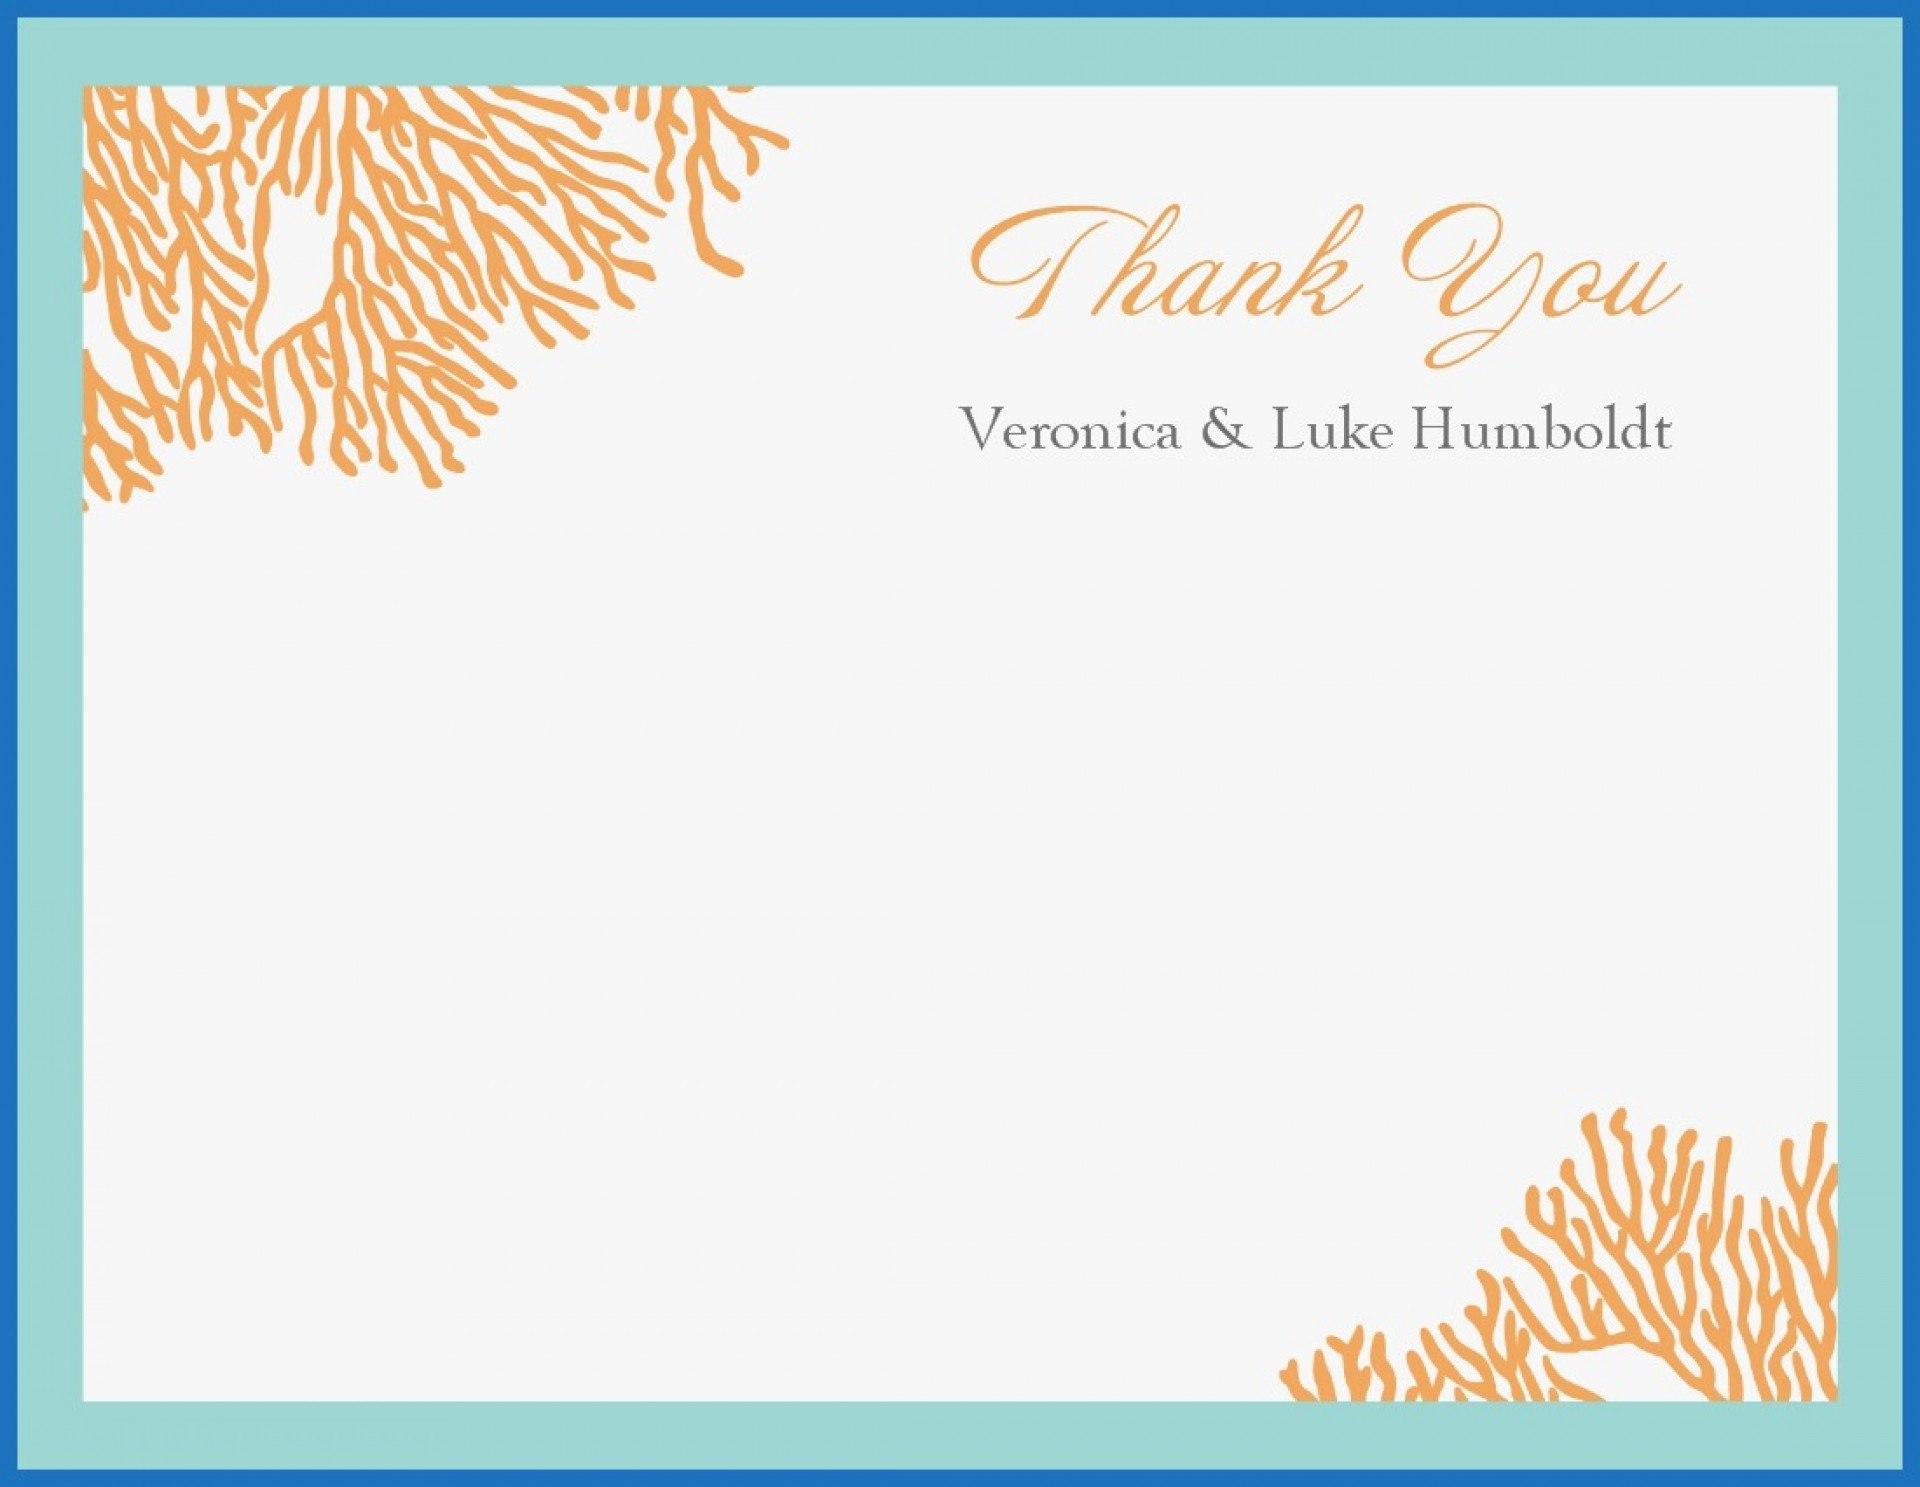 Thank You Card Printable Word Free Top Template ~ Istherewhitesmoke Regarding Thank You Card Template Word